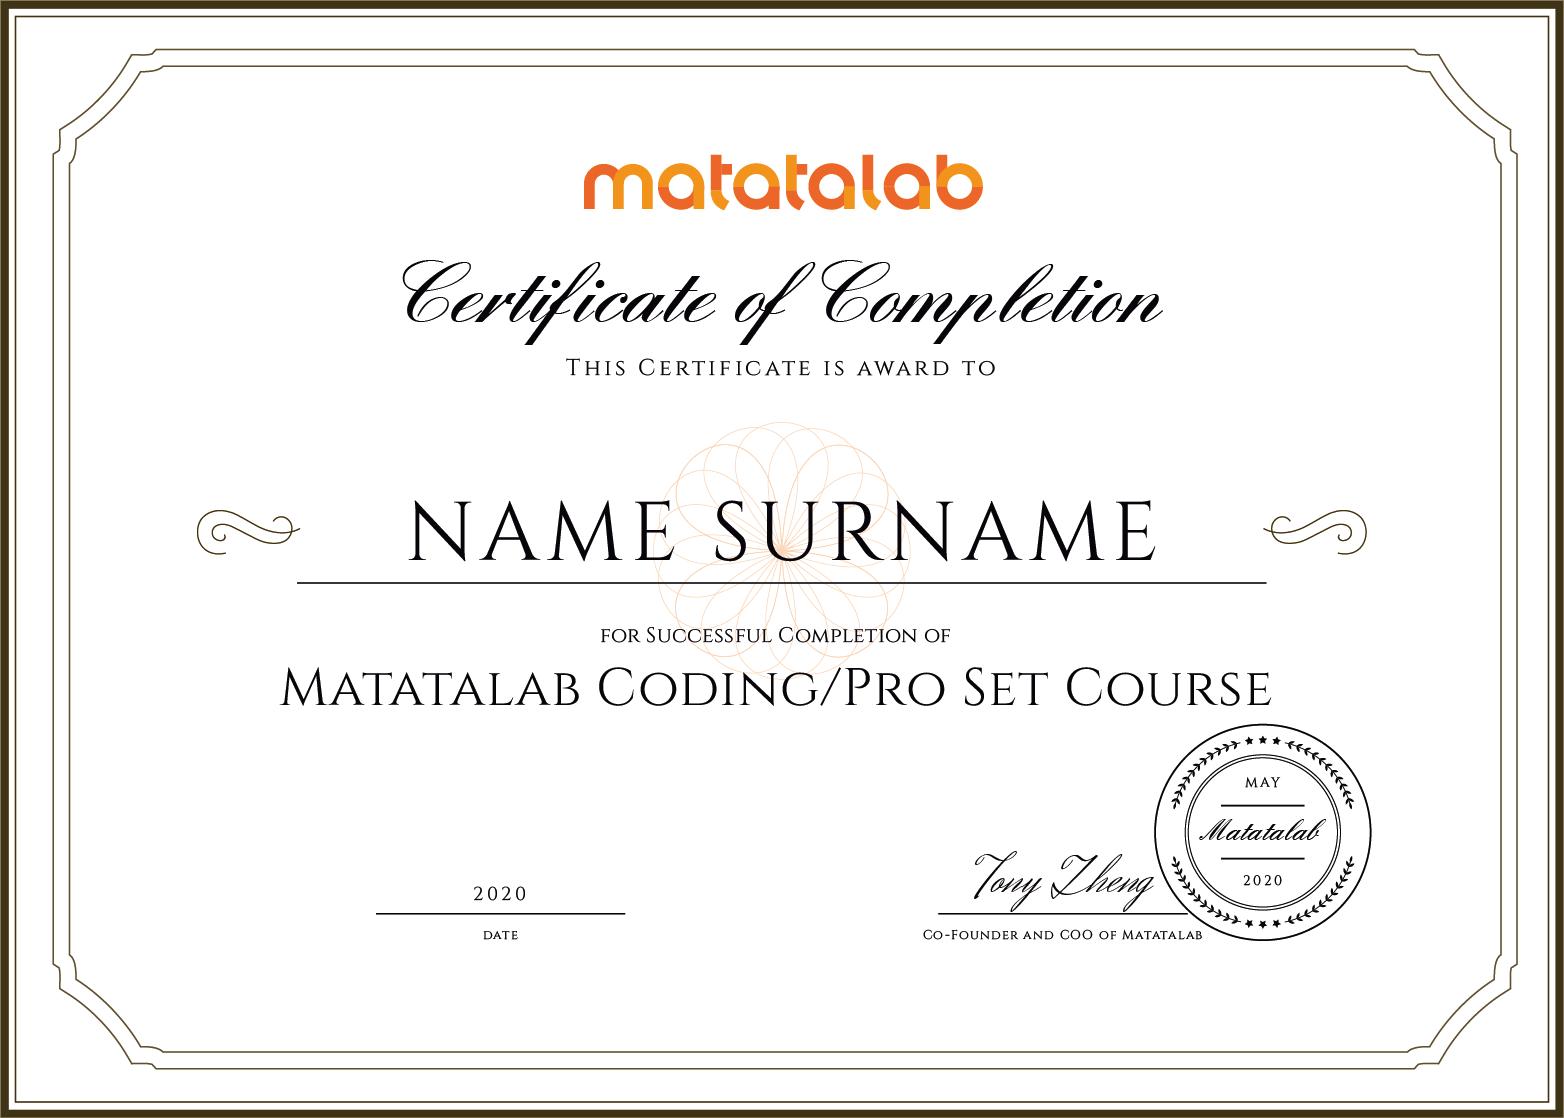 Matatalab Coding Set Course - Coding Toys - Matatalab